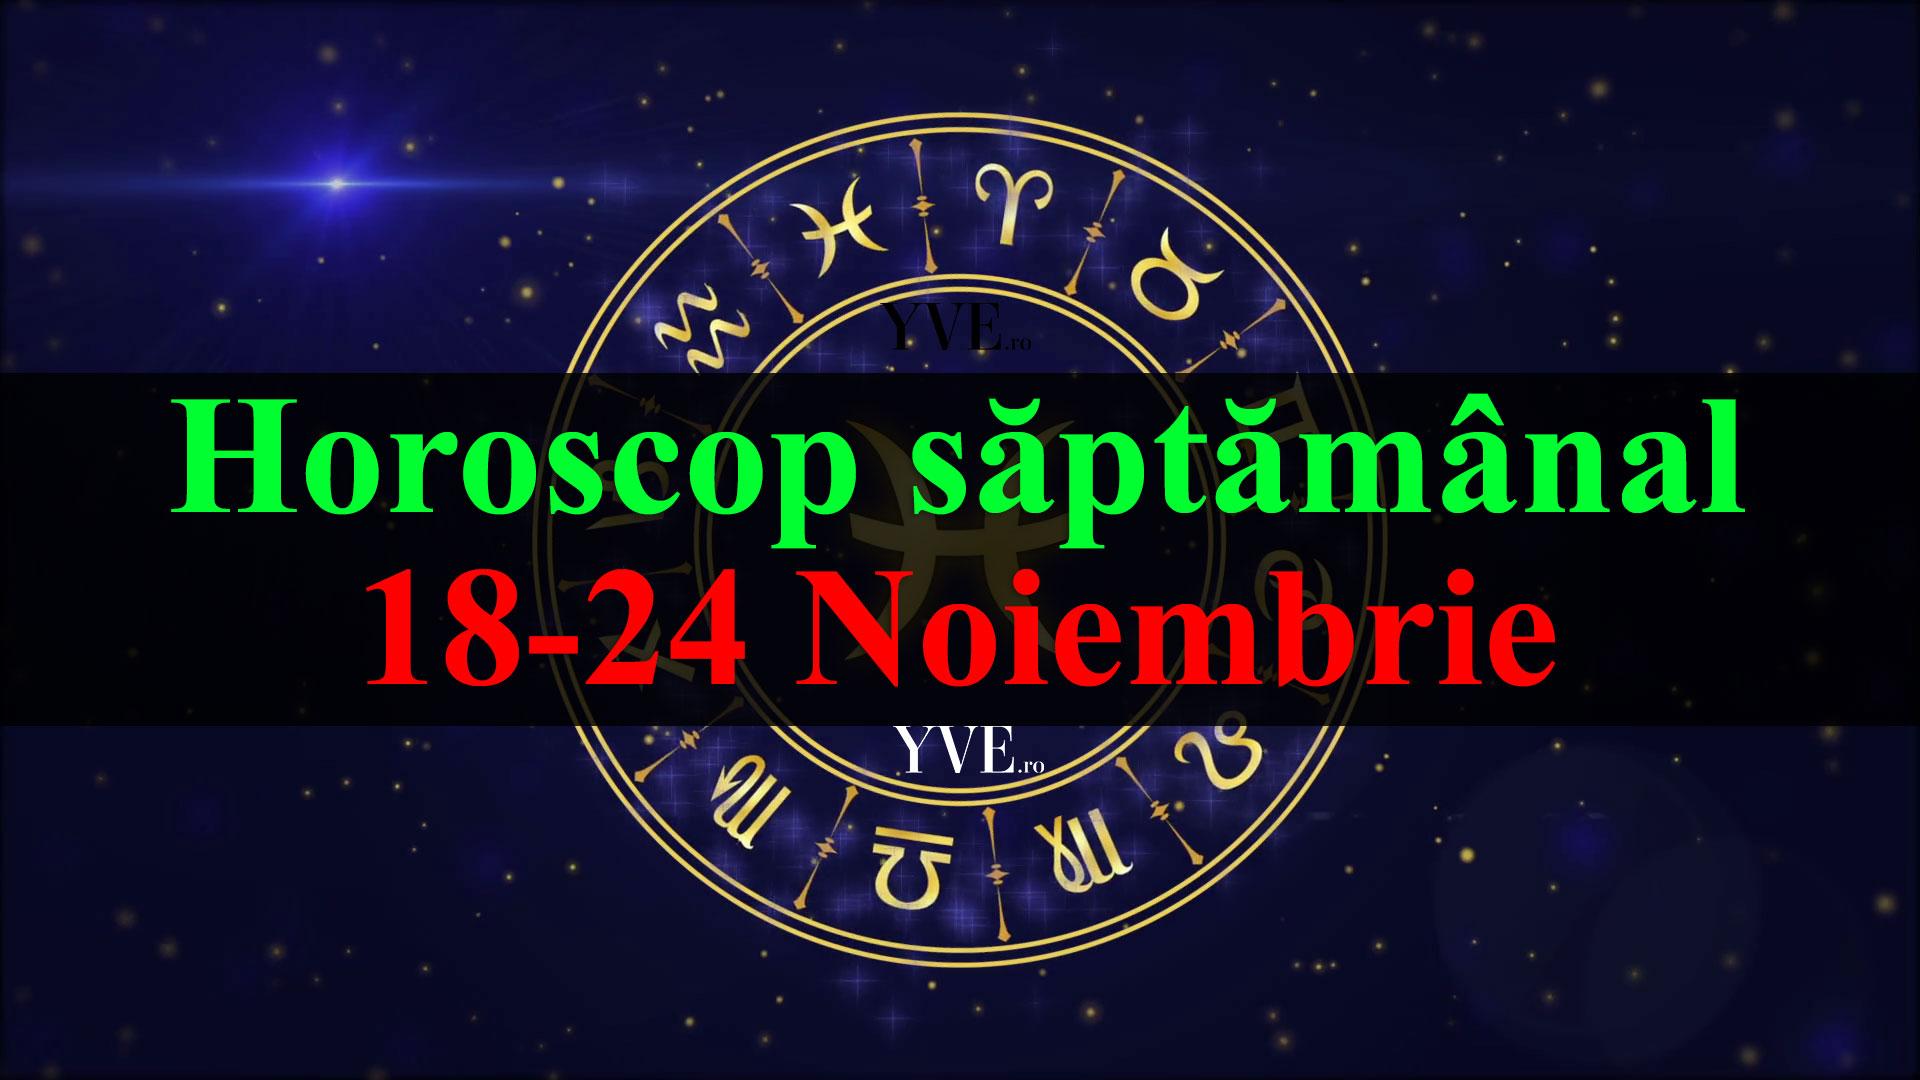 Horoscop saptamanal 18-24 Noiembrie 2019